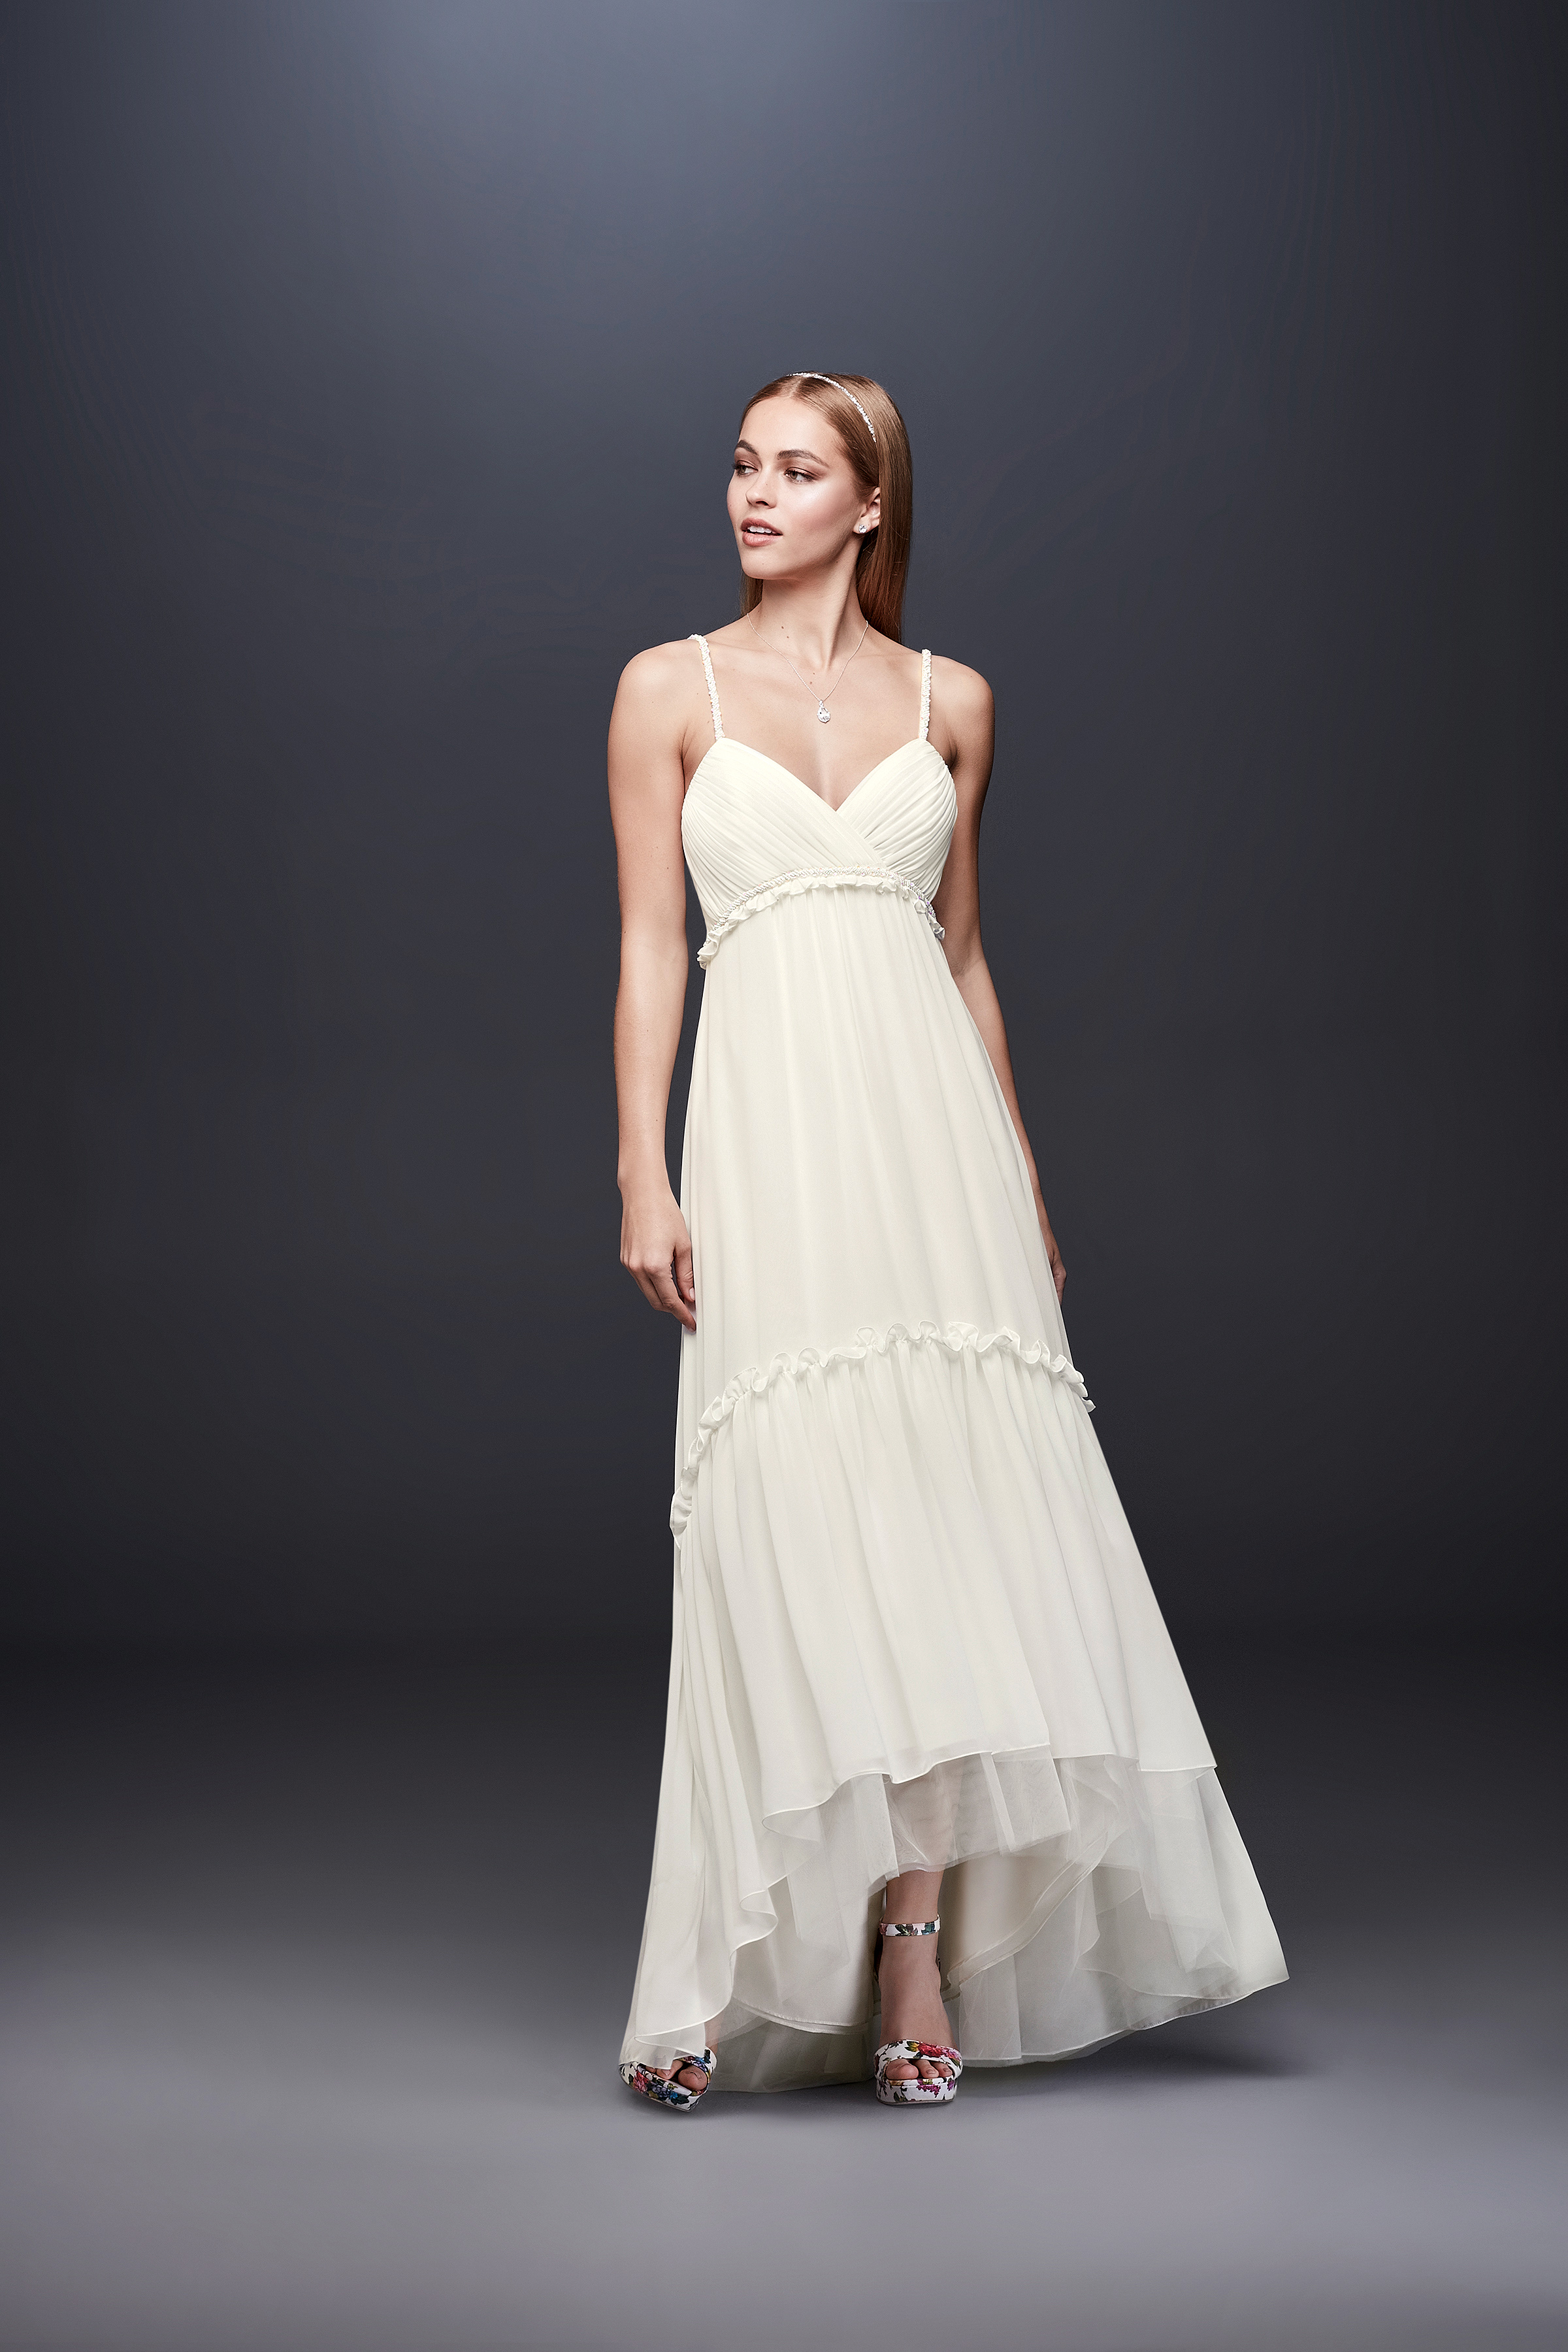 david bridal wedding dress spring 2019 spaghetti strap high-low hem v-neck